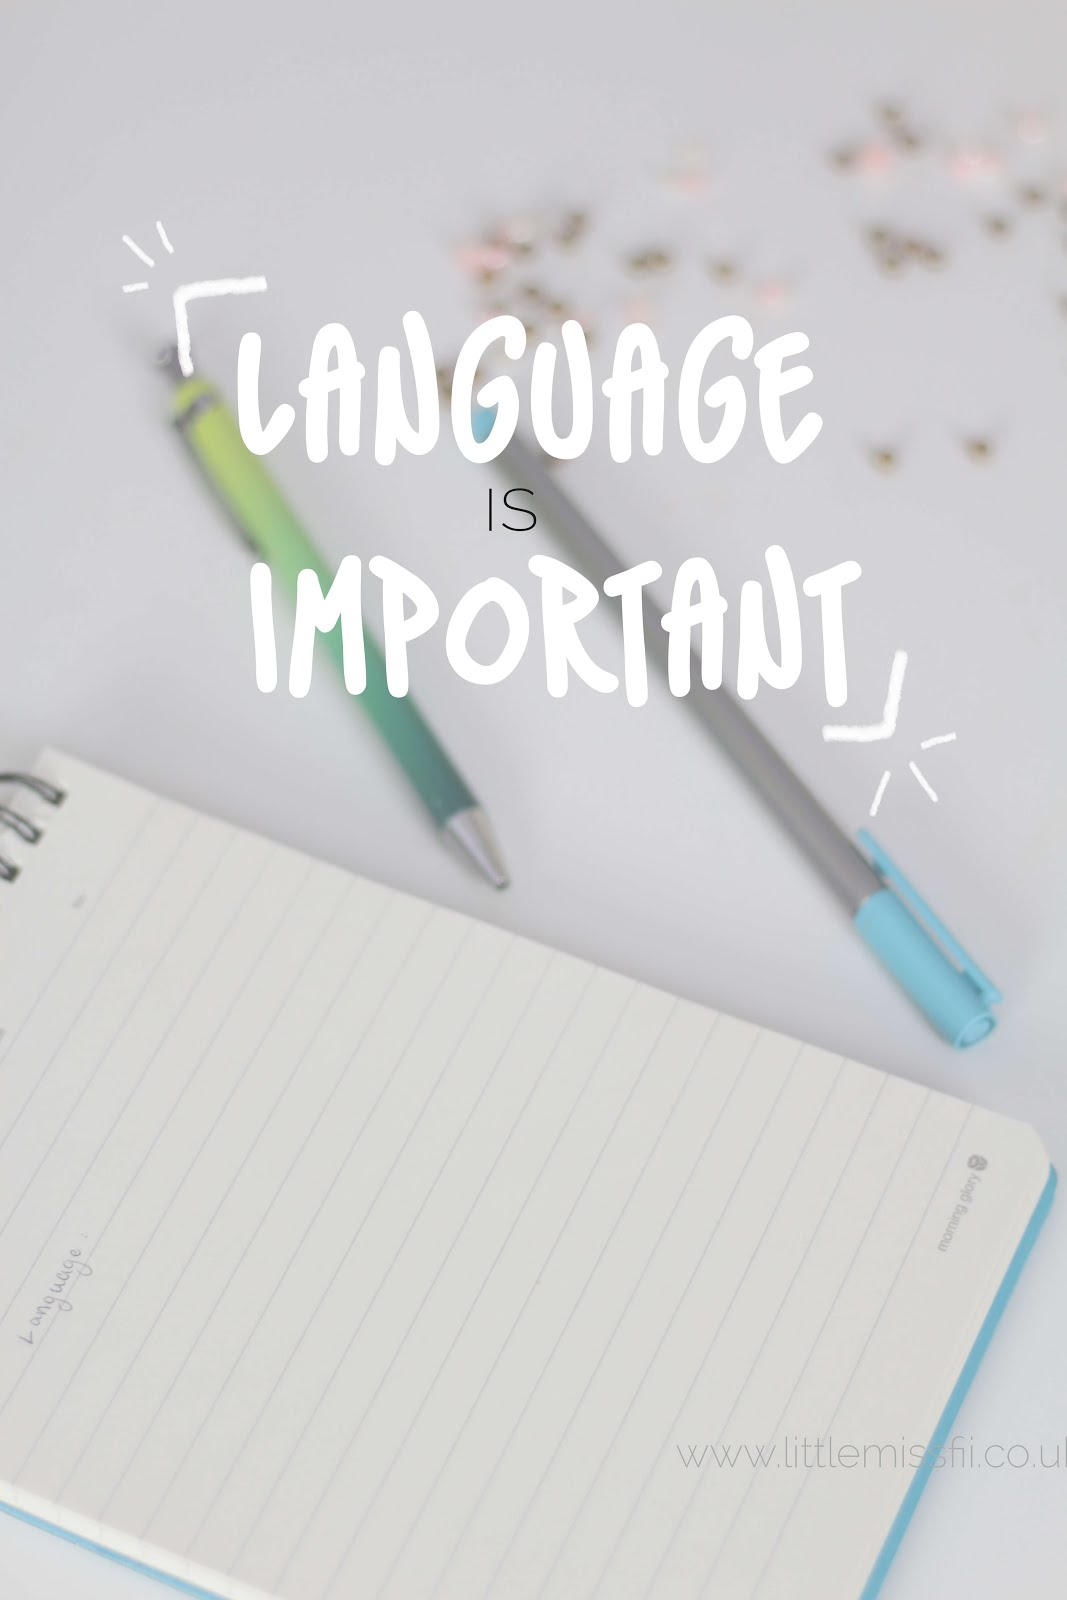 language used speech important politics